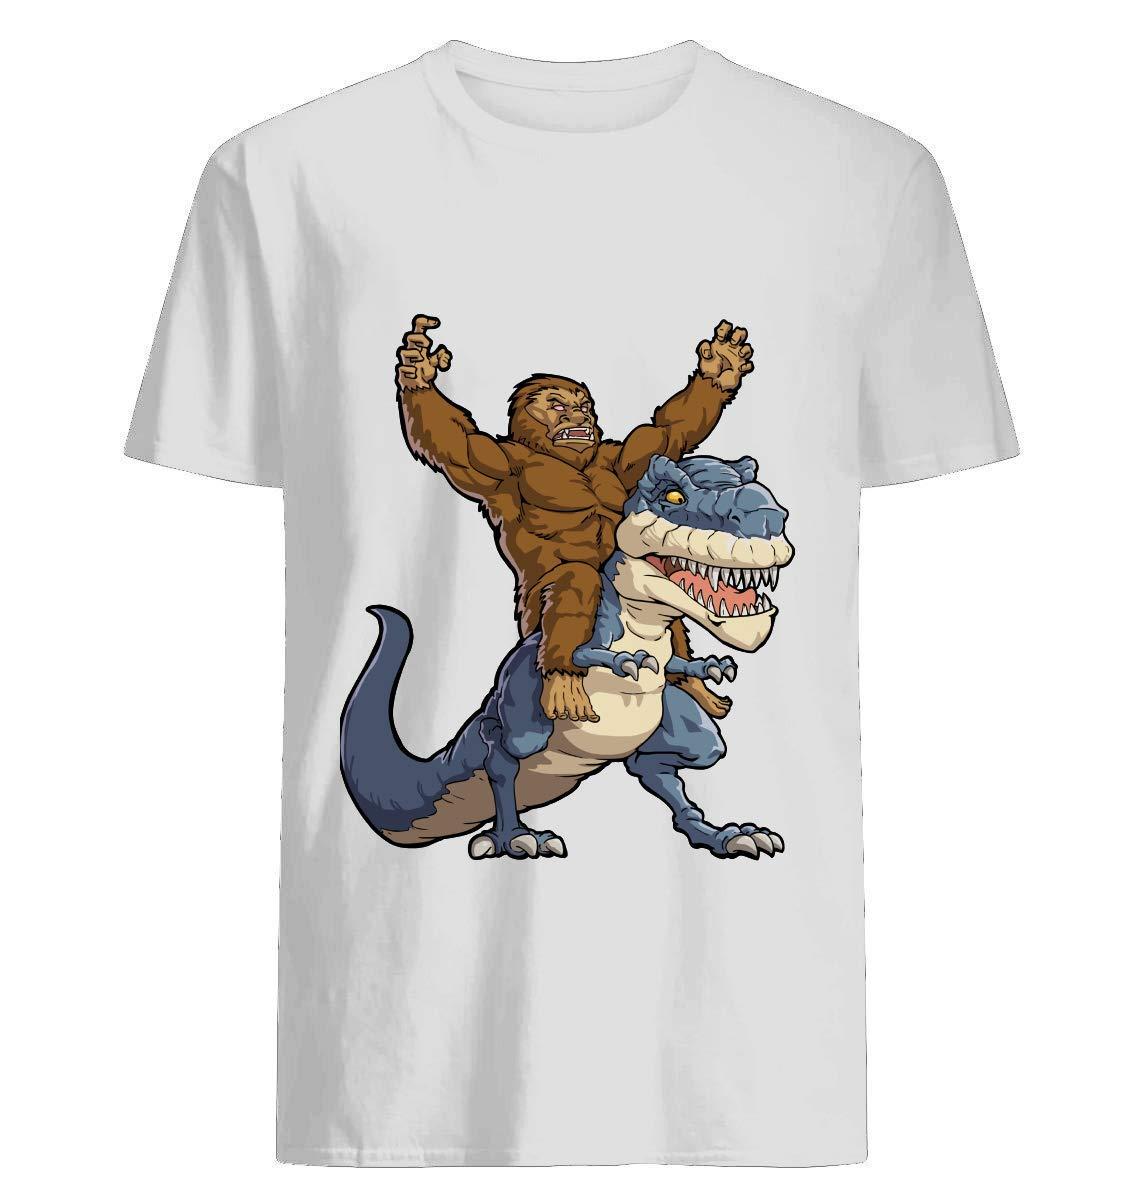 Sasquatch Riding T Rex Tyrannosaurus Dinosaur T Shirt Funny Monster Gift T Shirt H